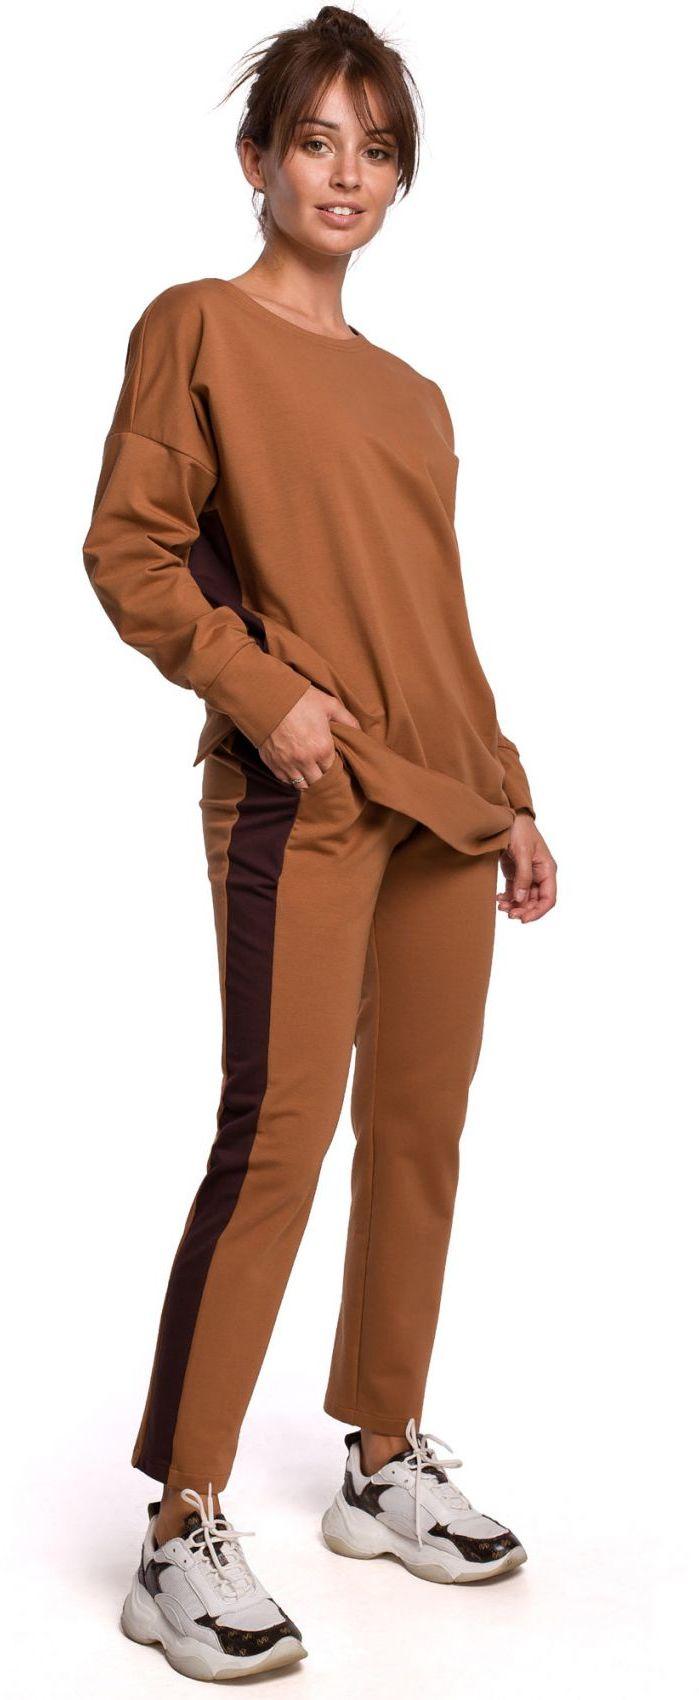 B173 Spodnie z lampasami - karmelowe